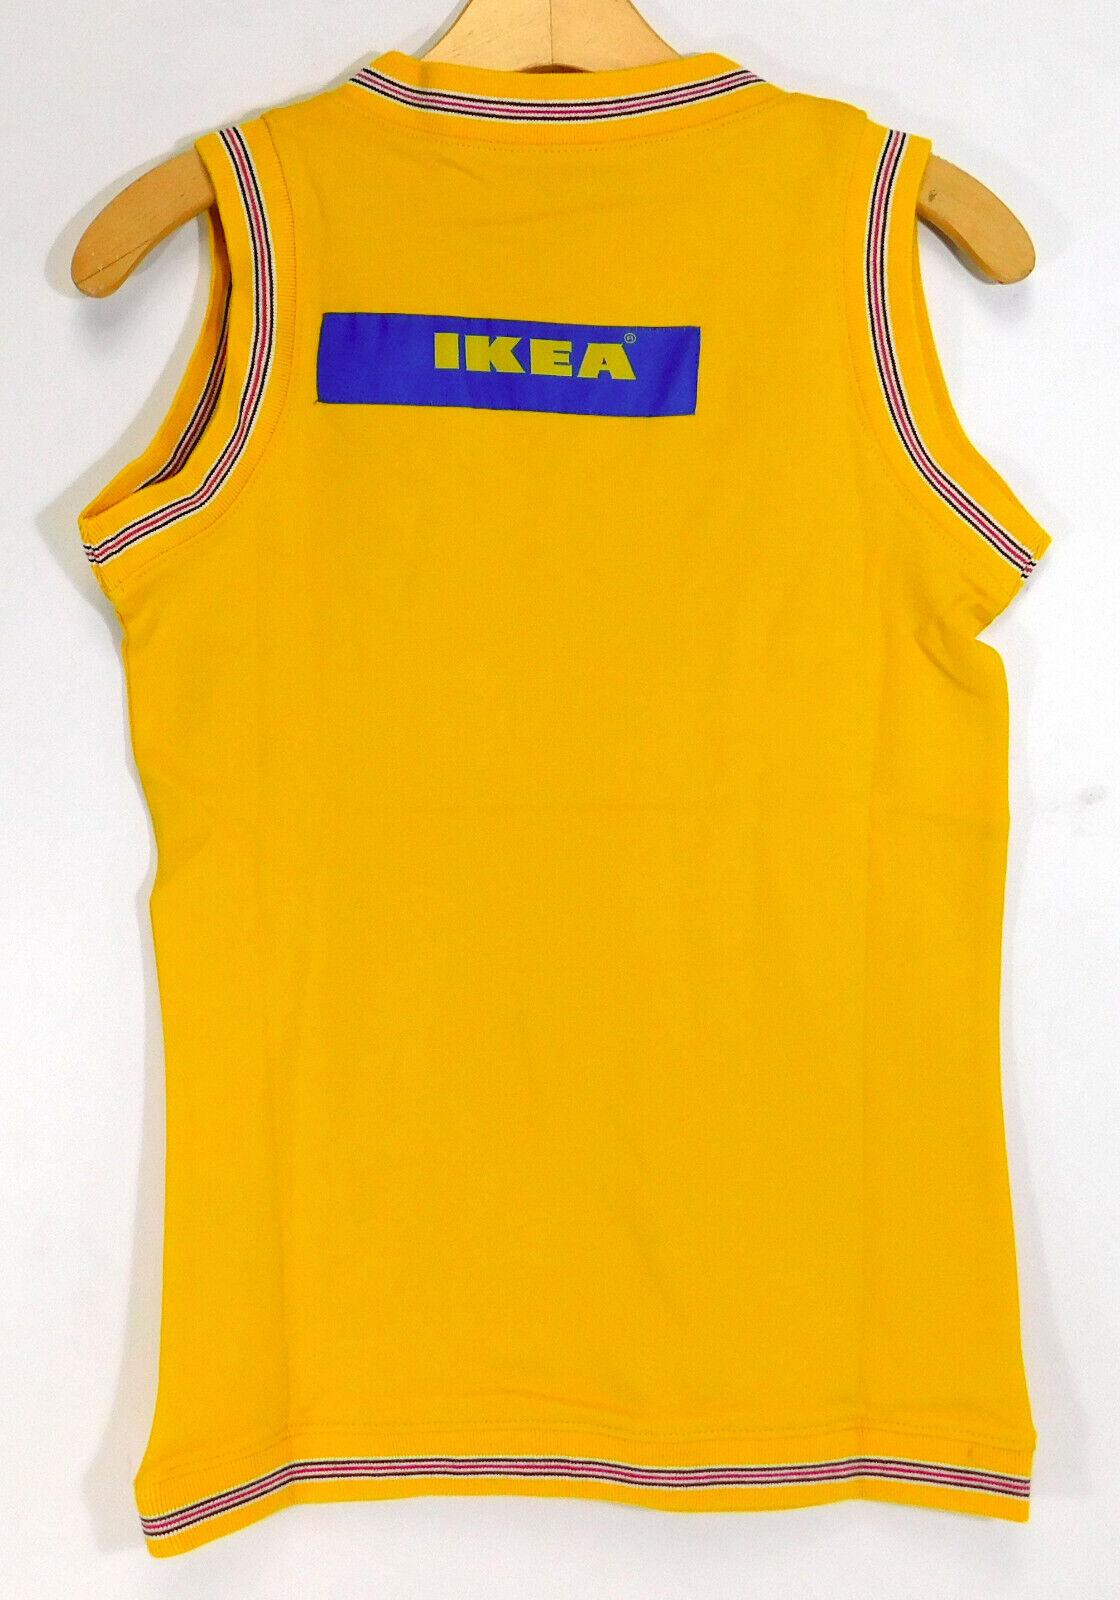 IKEA 2007 Logo SLIPOVER Sweater Vest SALES FEMALE Employee Yellow NEW W33 L25